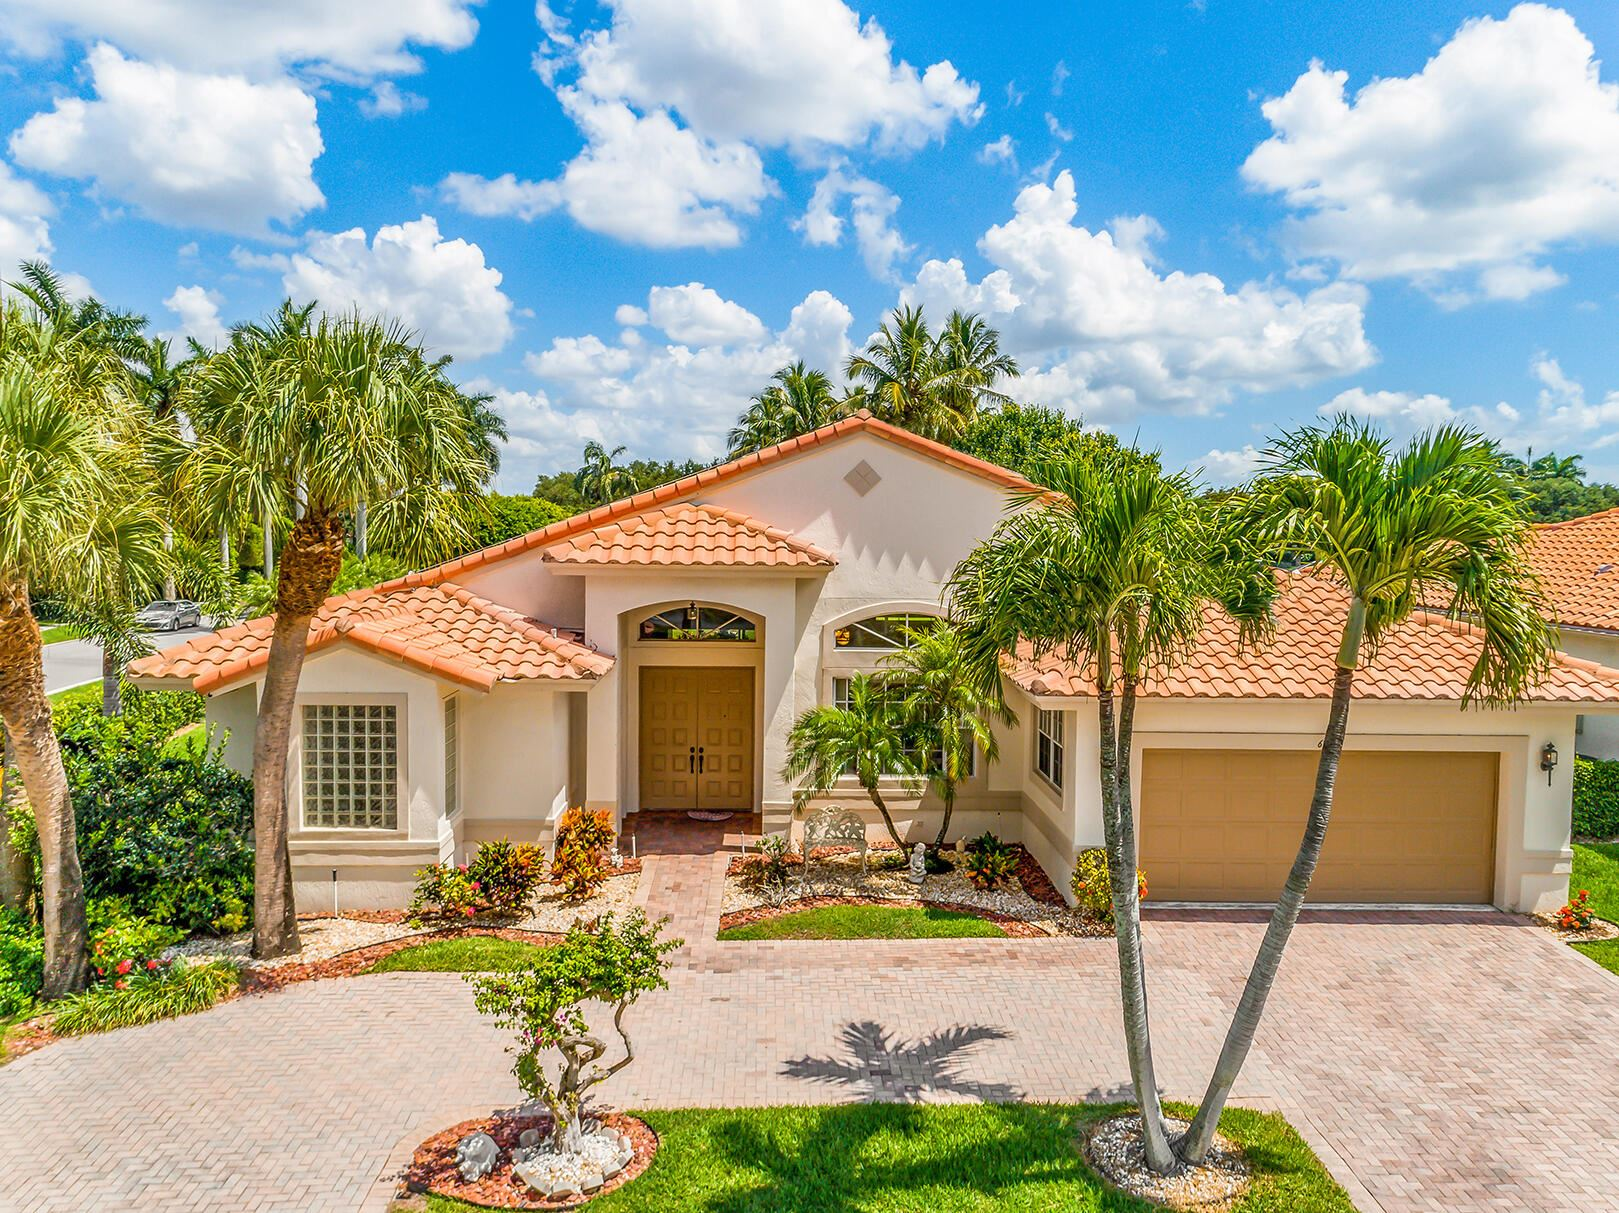 6783 E Liseron, Boynton Beach, FL 33437 - MLS#: RX-10712323